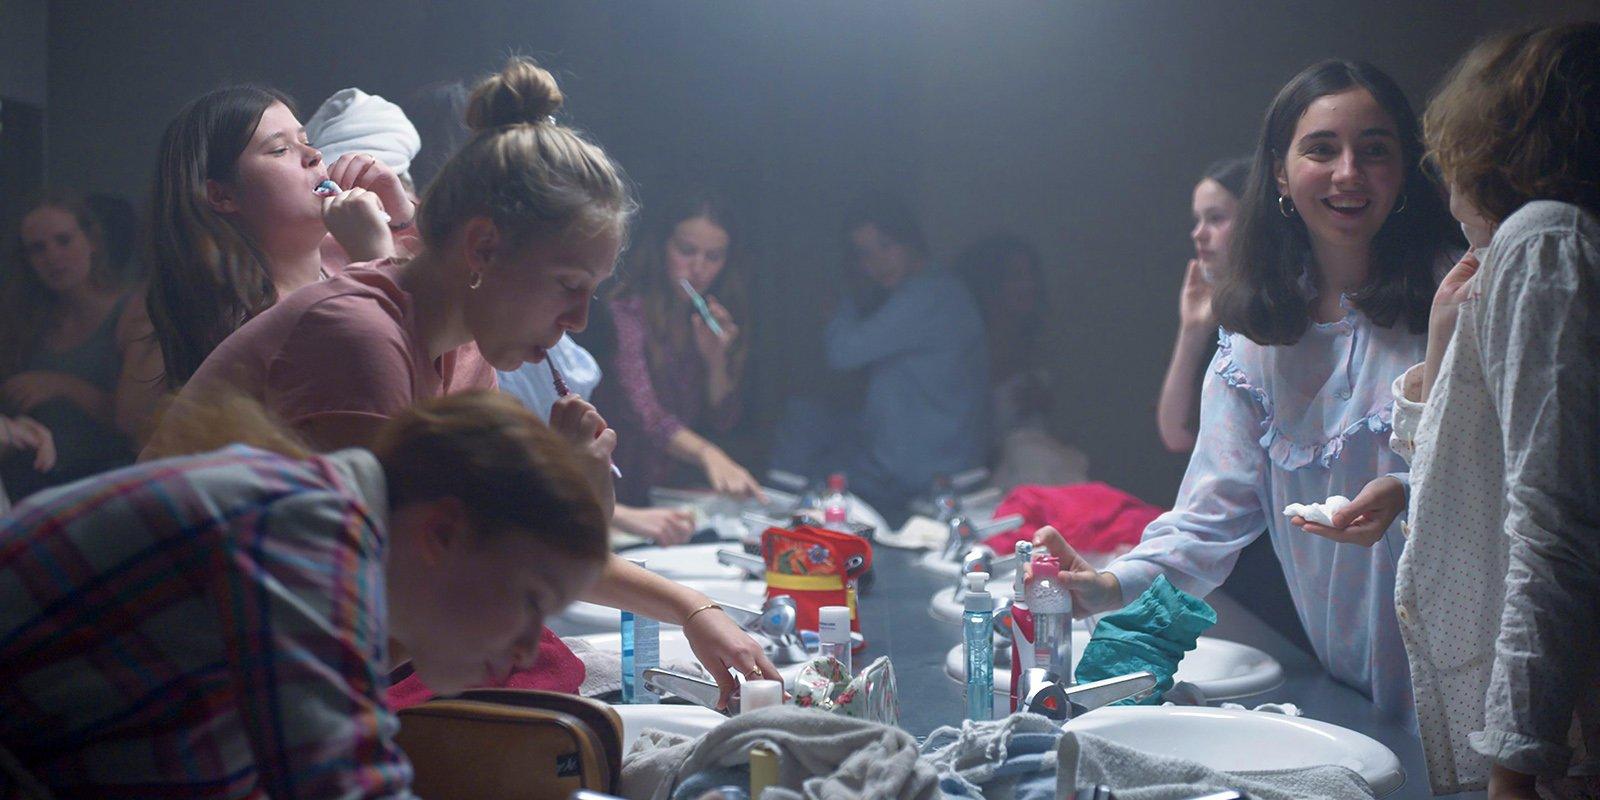 Кадр из фильма «Малышка зомби». Режиссер Бертран Бонелло. 2019 год